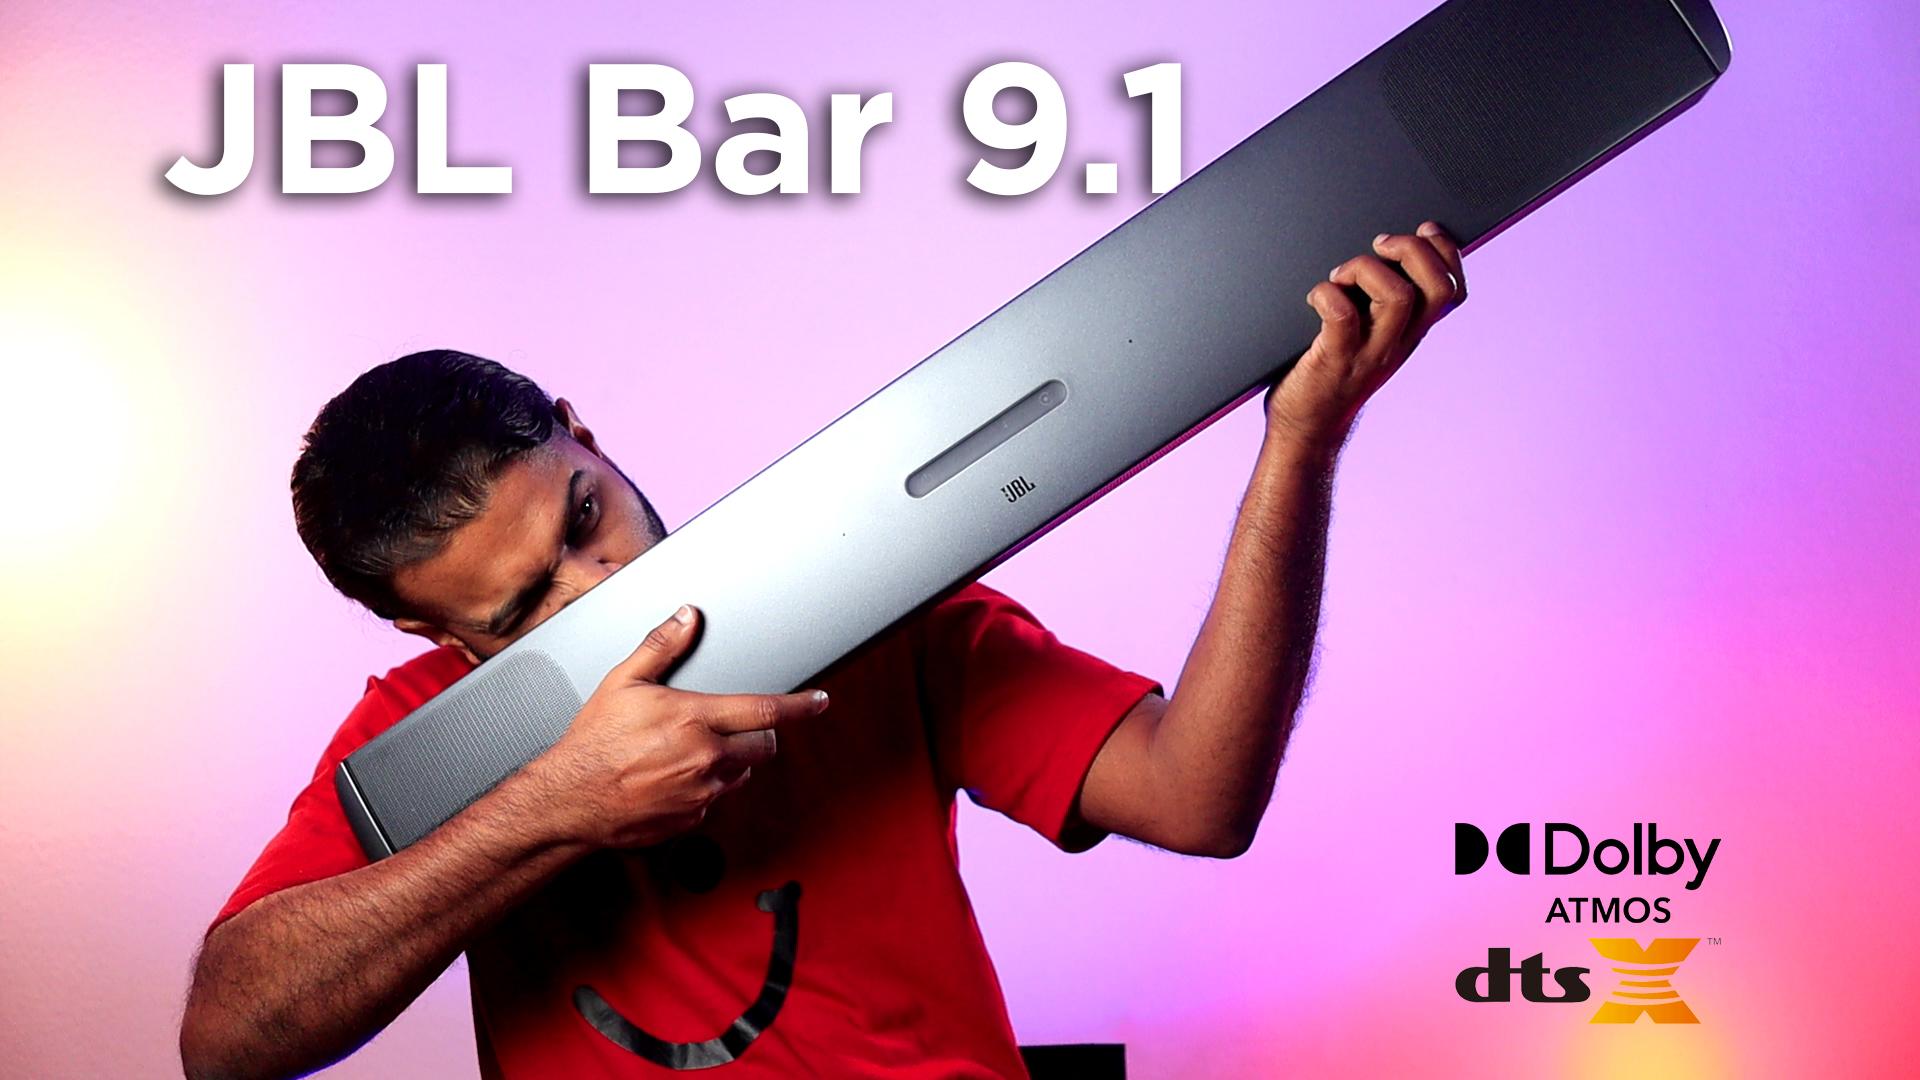 JBL 9.1 Dolby Atmos soundbar